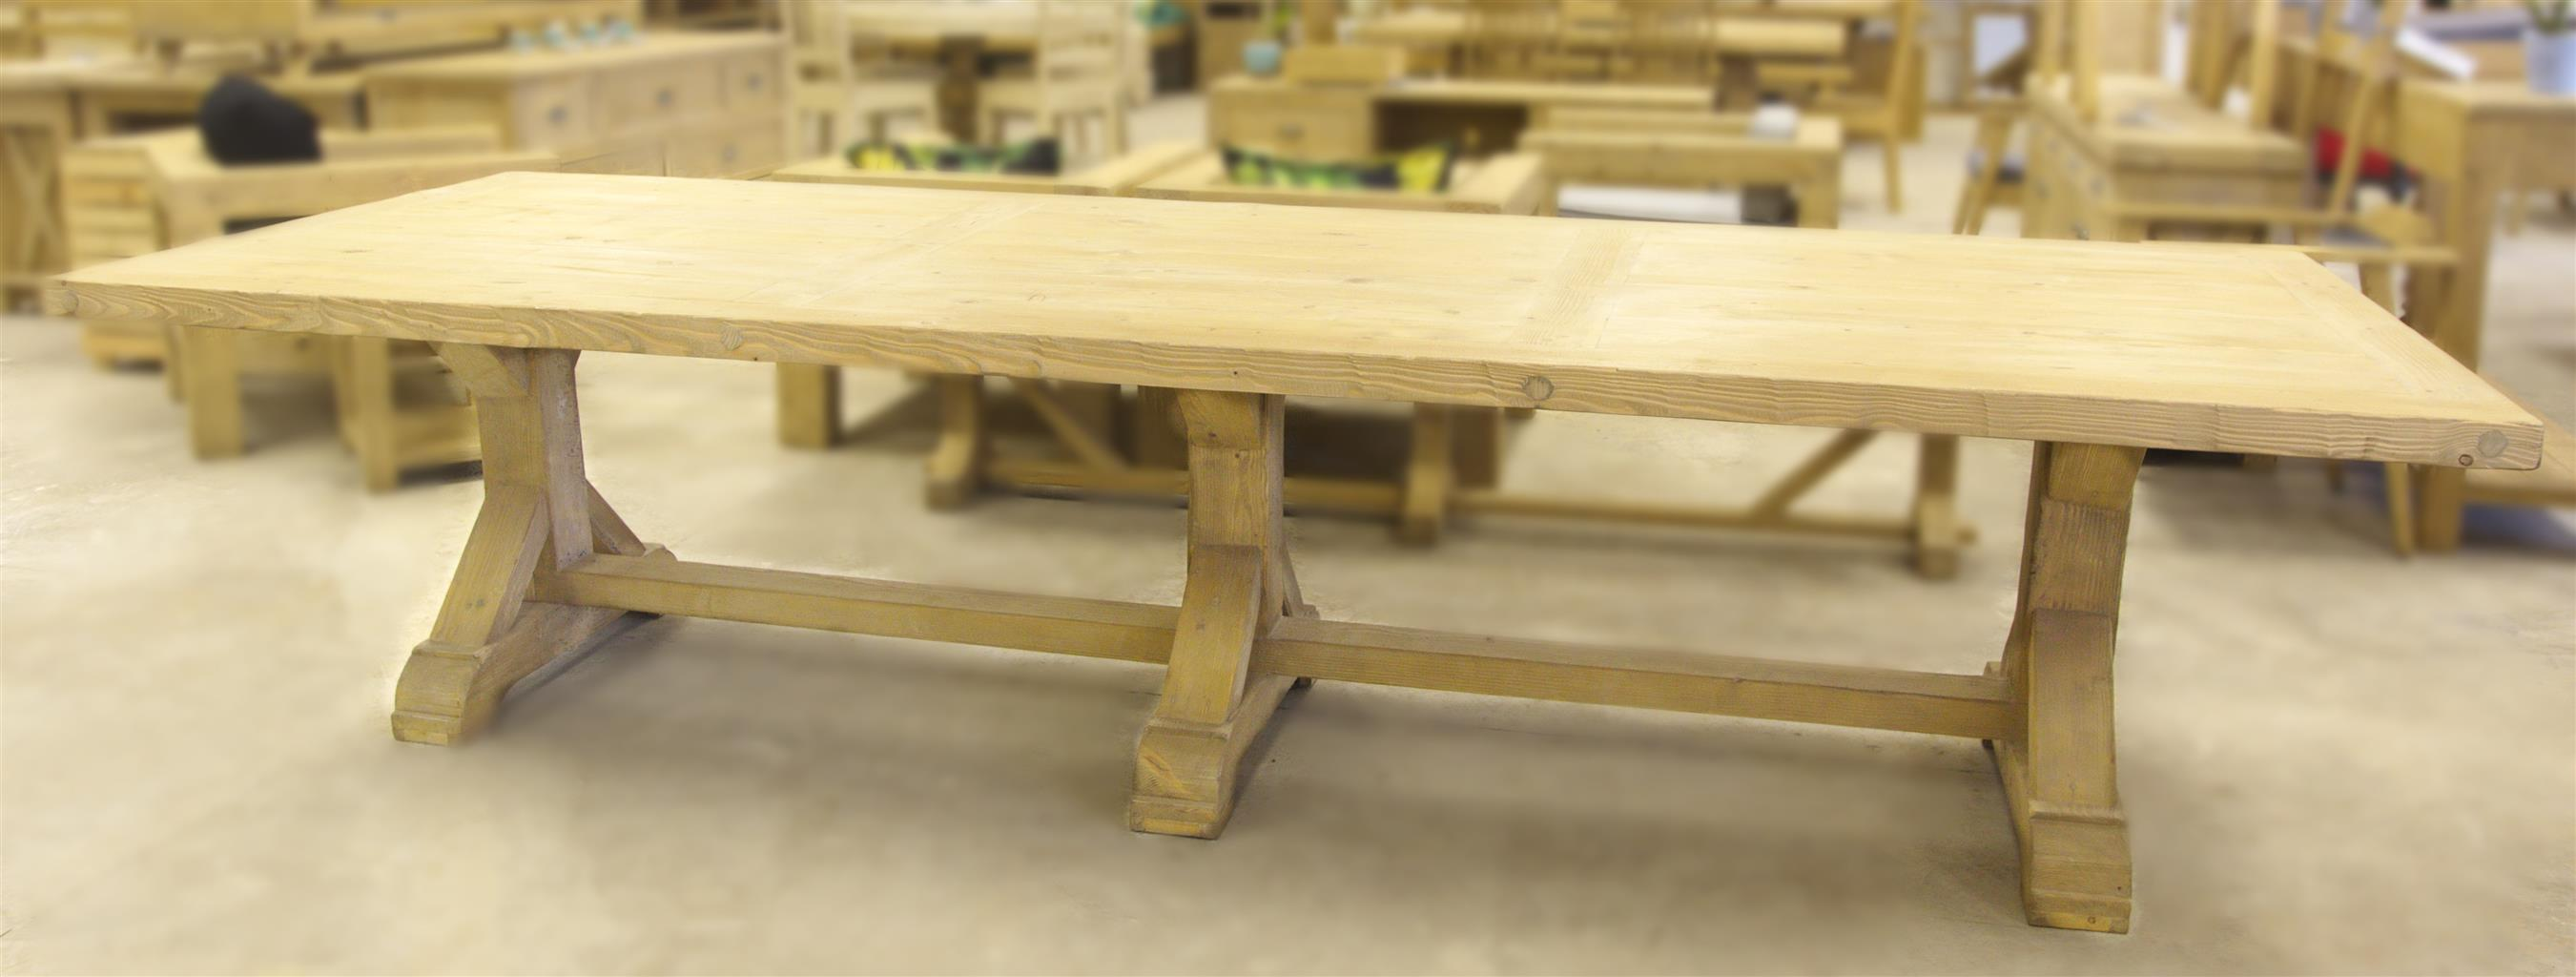 Strong Leg Table